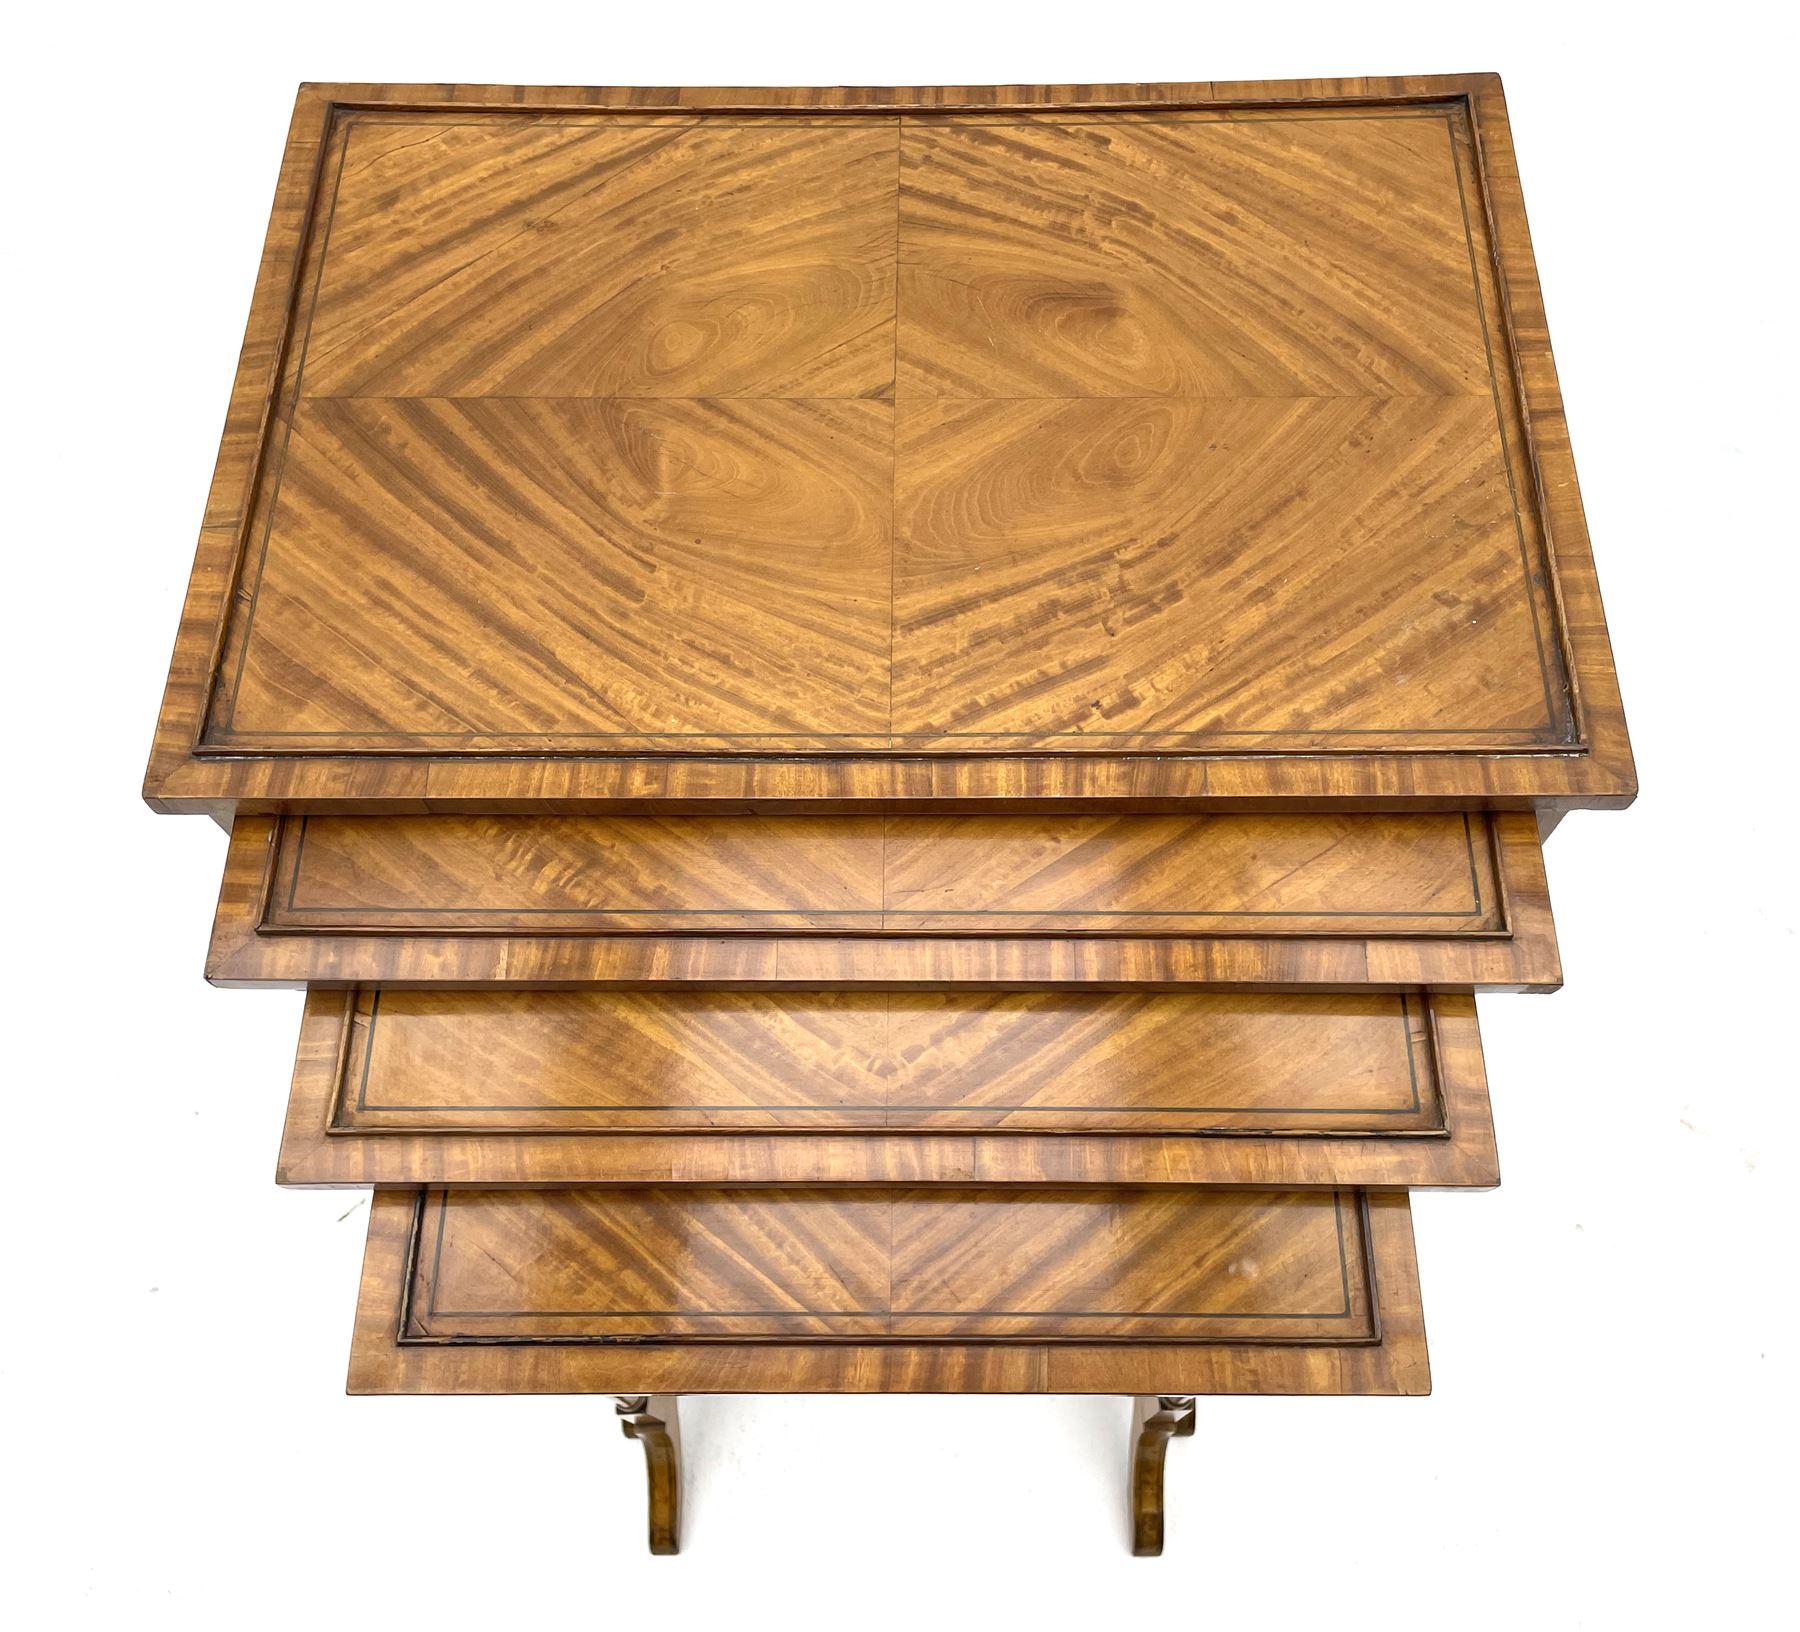 Edwardian satinwood quartetto nest of occasional tables - Image 6 of 6